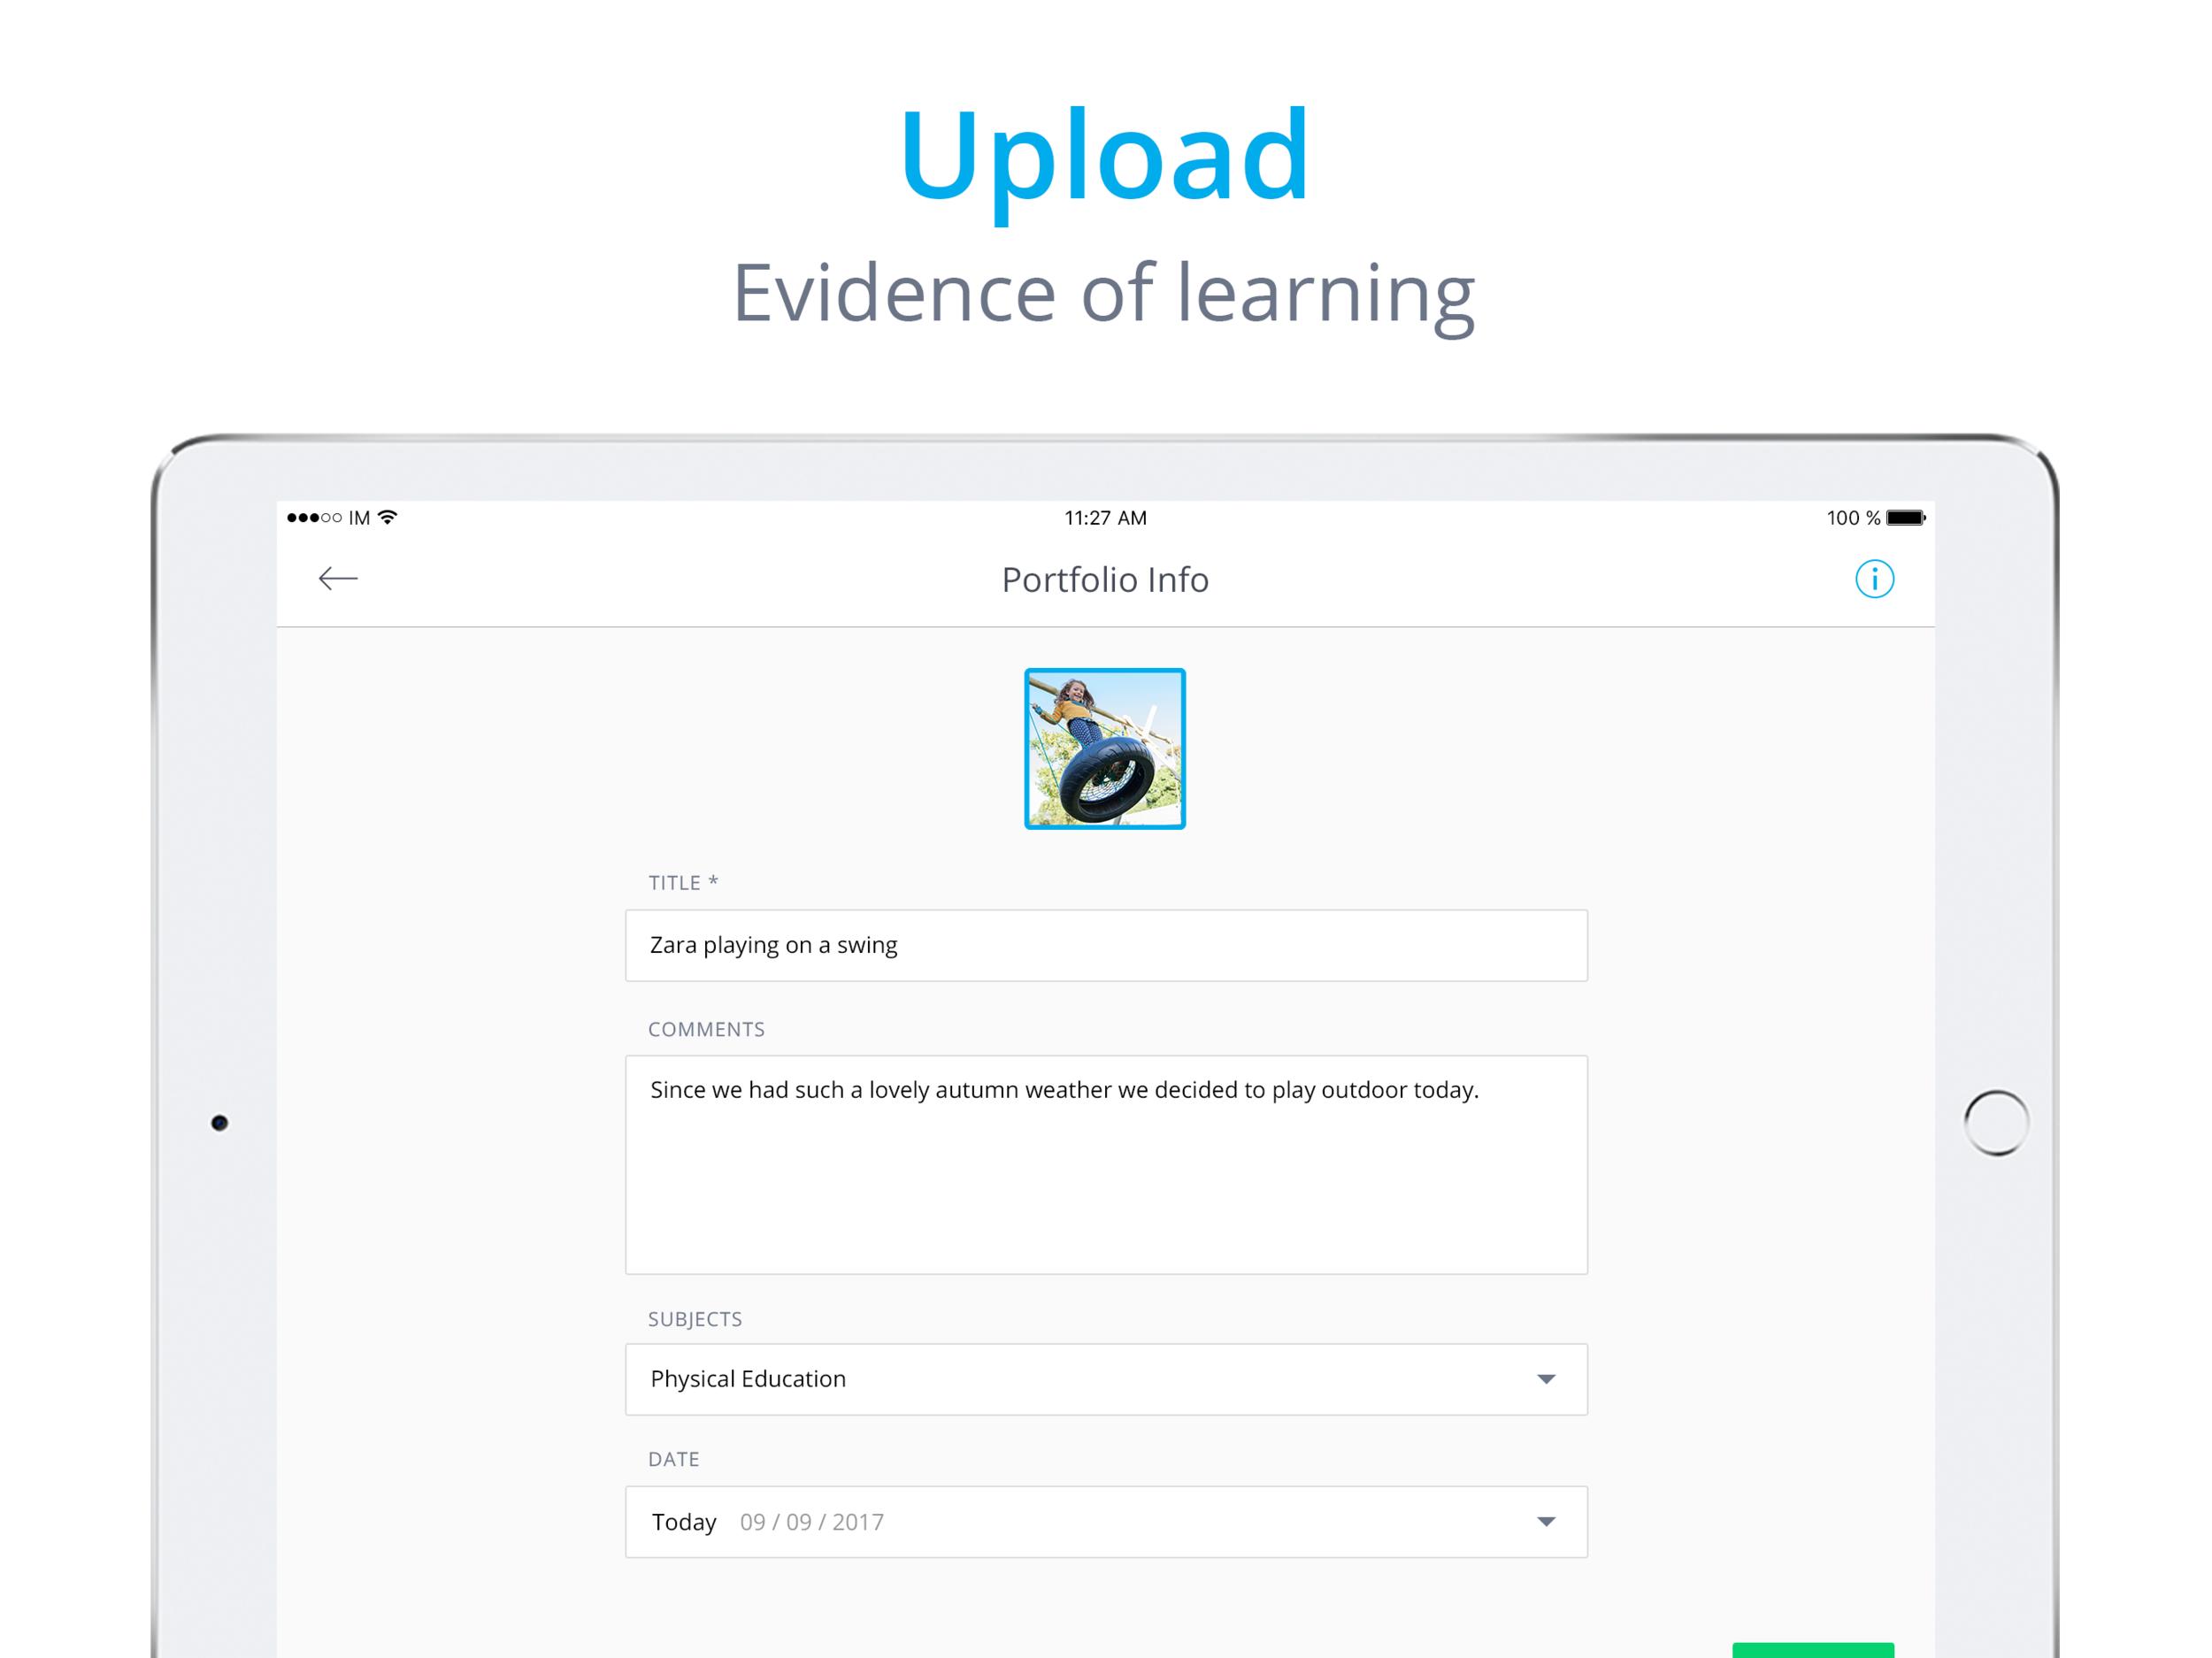 InfoMentor Media App - iPad Screenshots 2.png